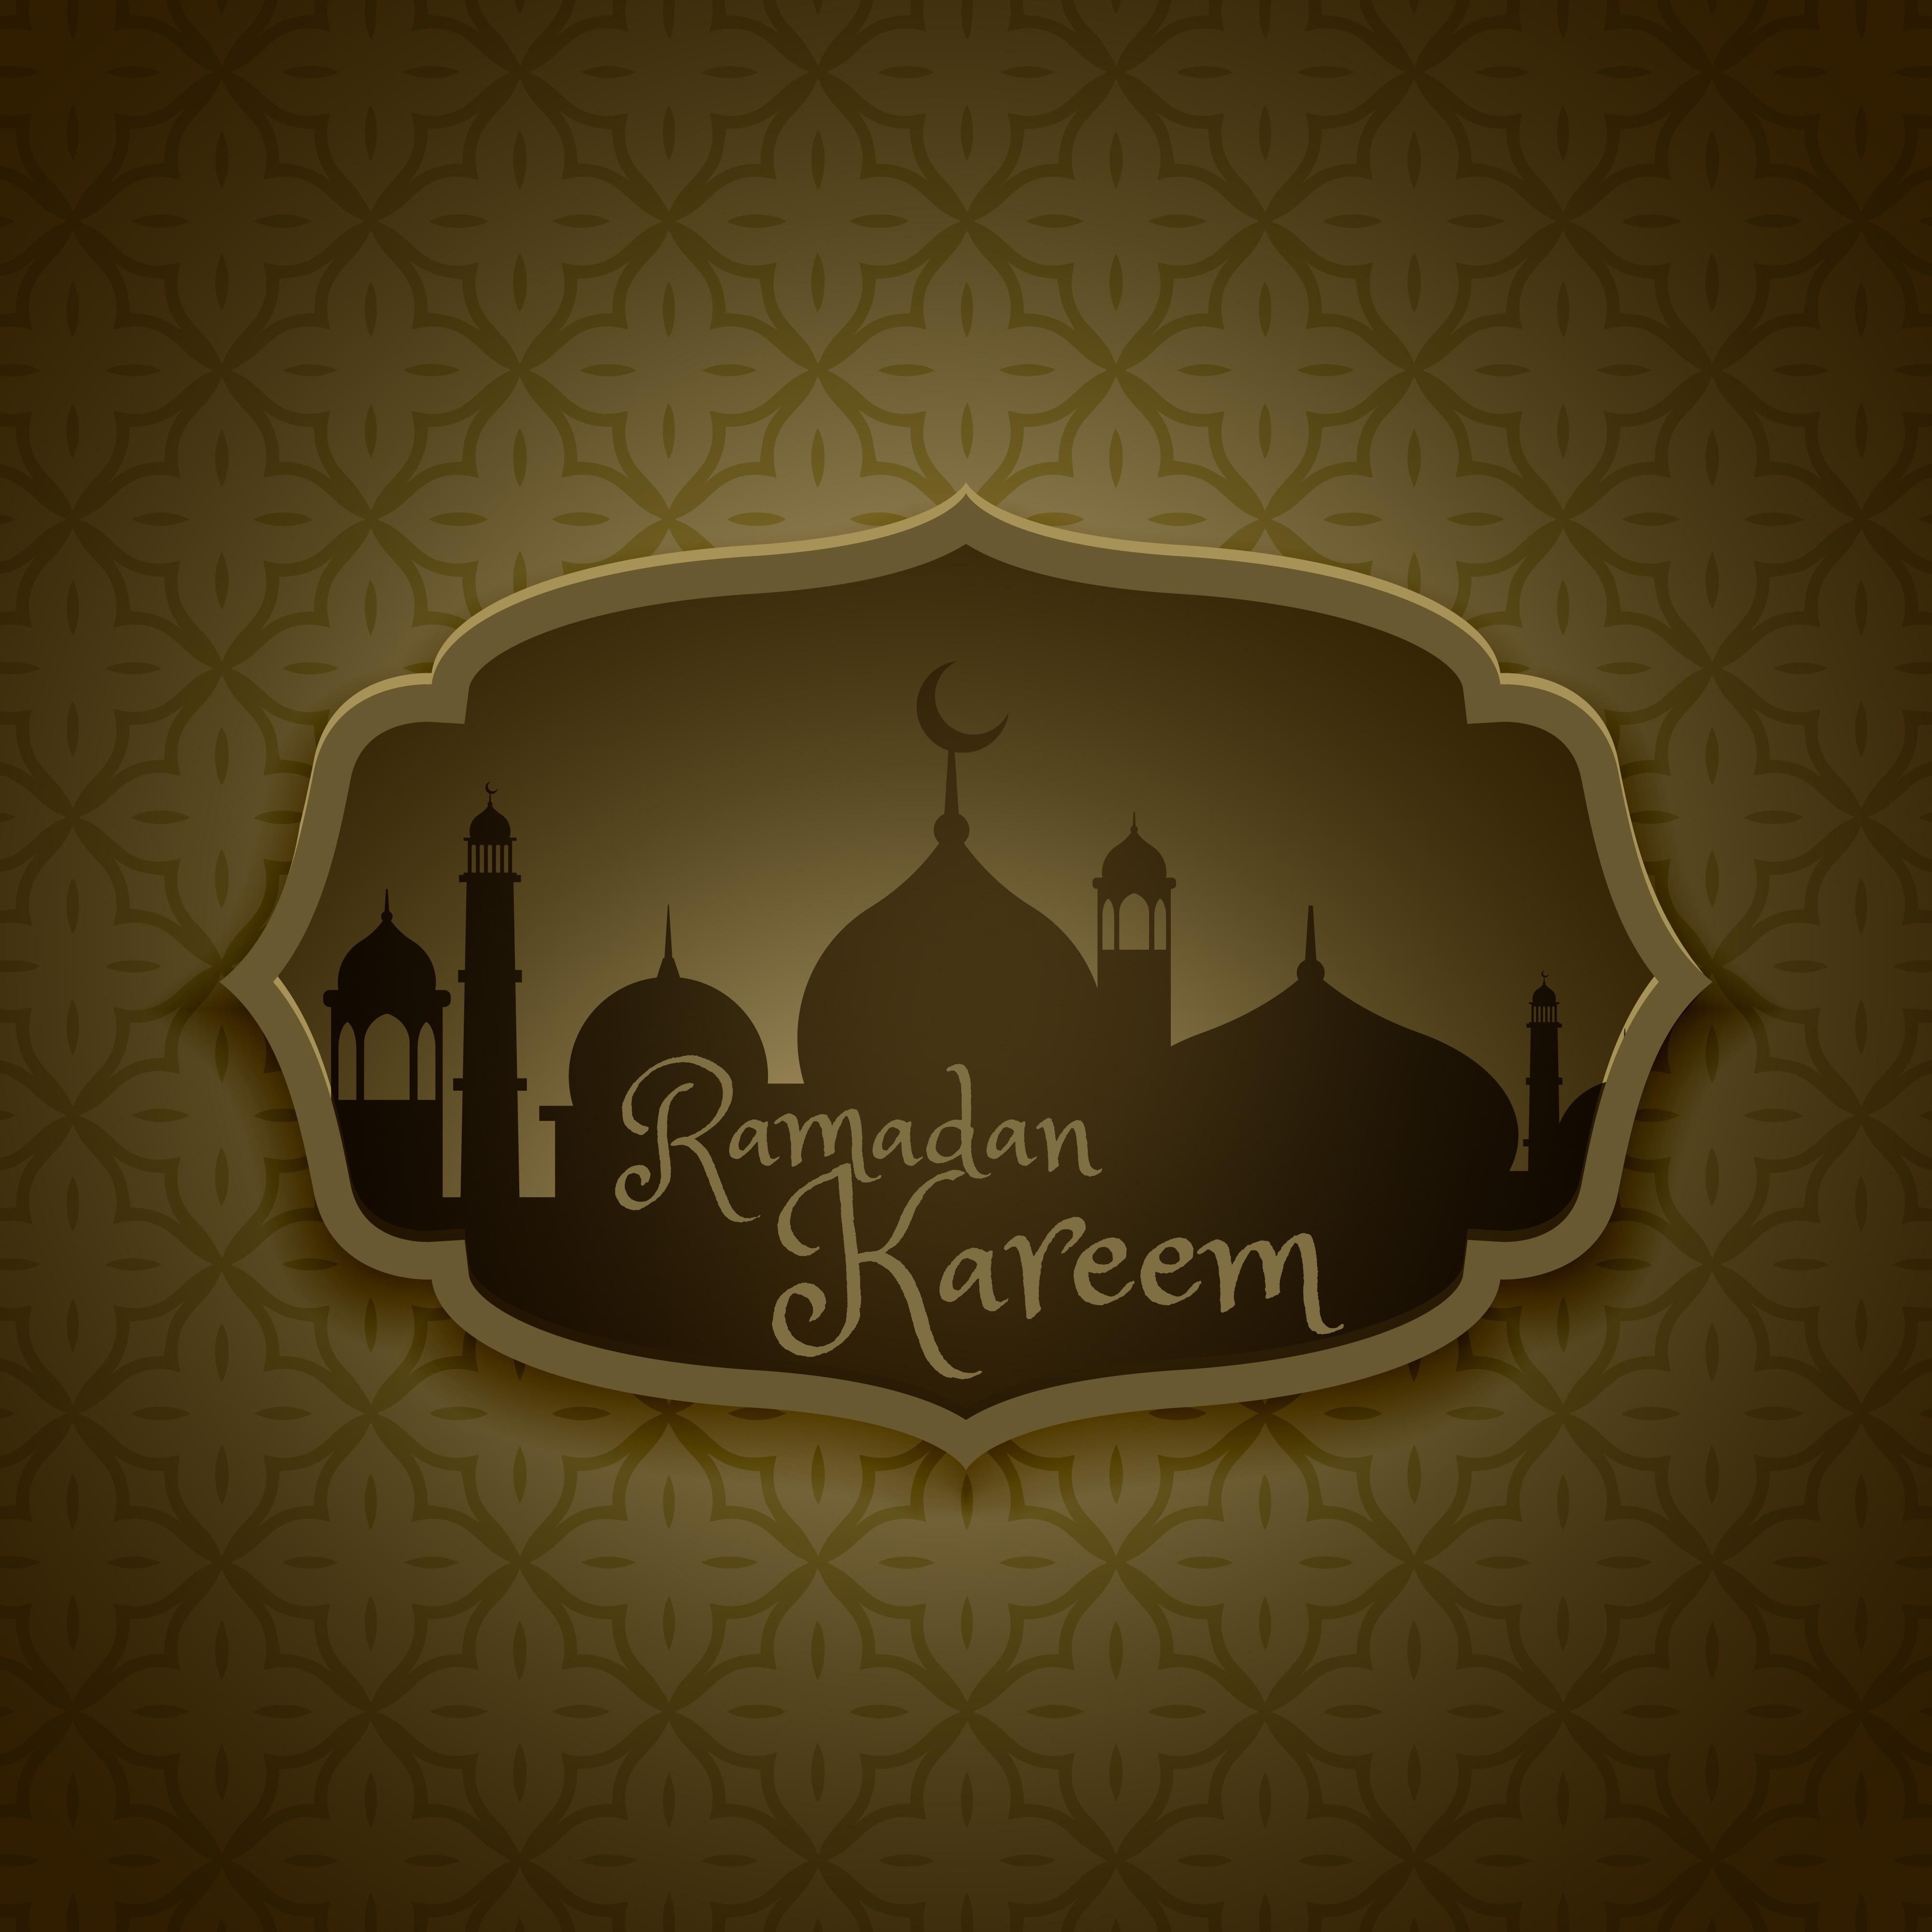 Islamic Ramadan Festival Greeting Design Download Free Vector Art